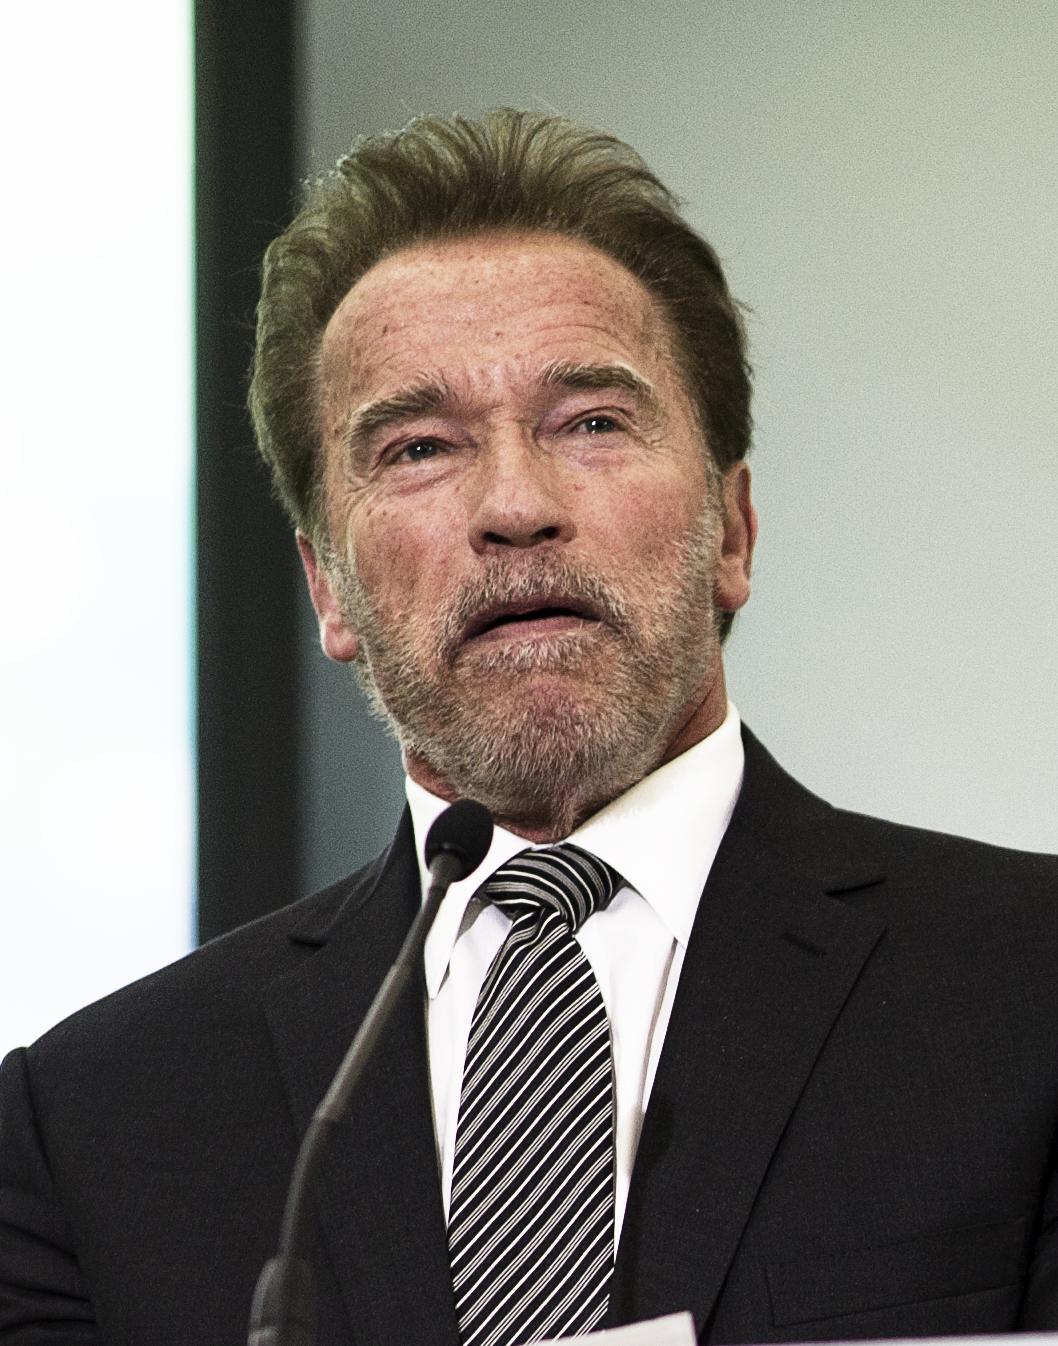 Arnold Schwarzenegger - Wikipedia Arnold Schwarzenegger